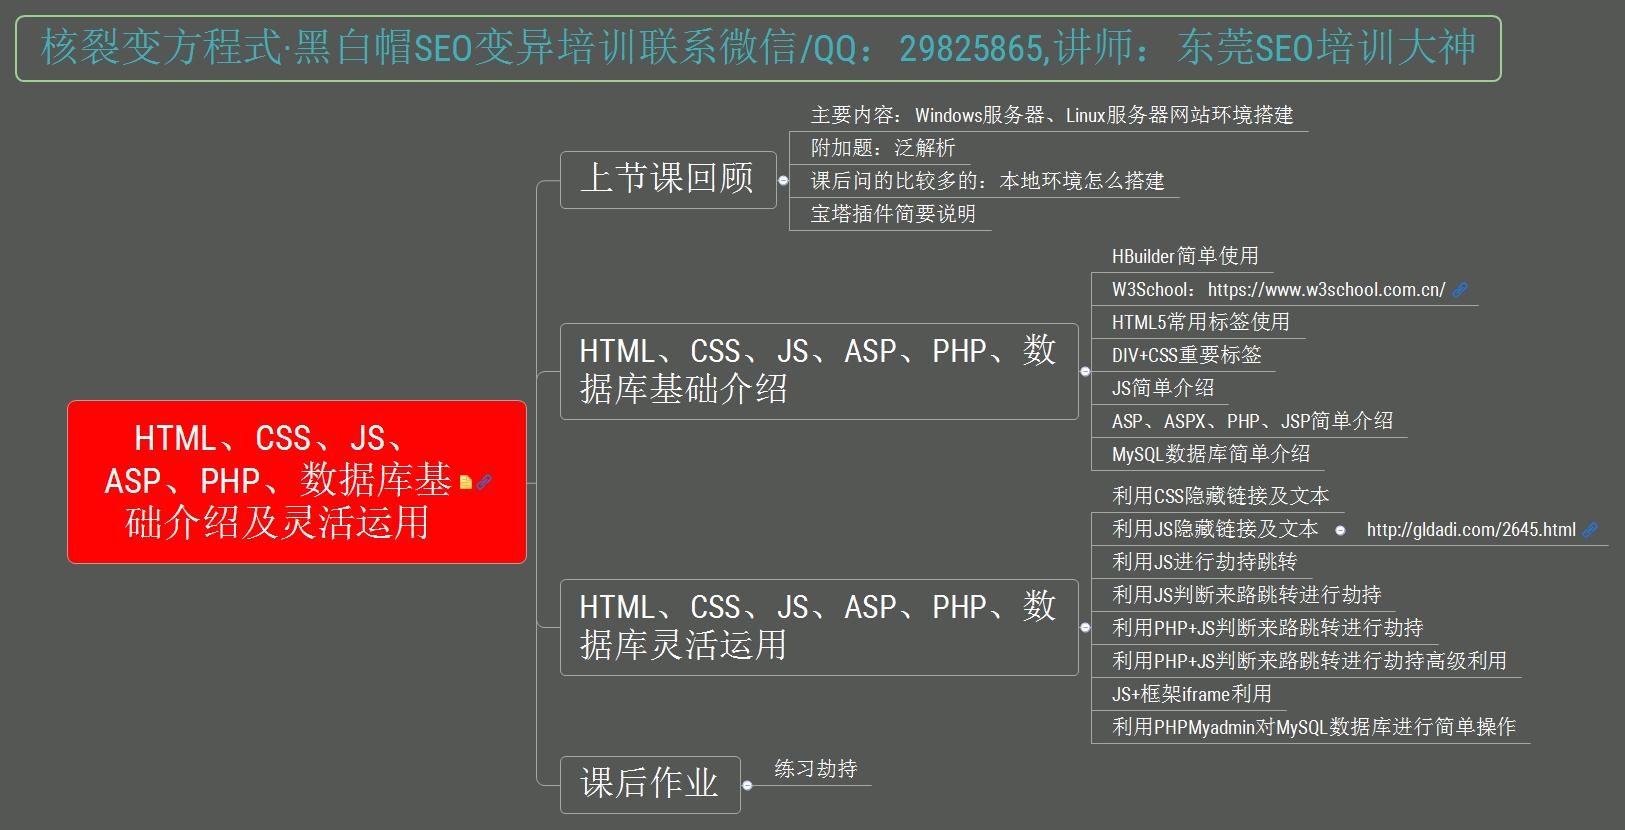 HTML、CSS、JS、ASP、PHP、数据库基础介绍及灵活运用